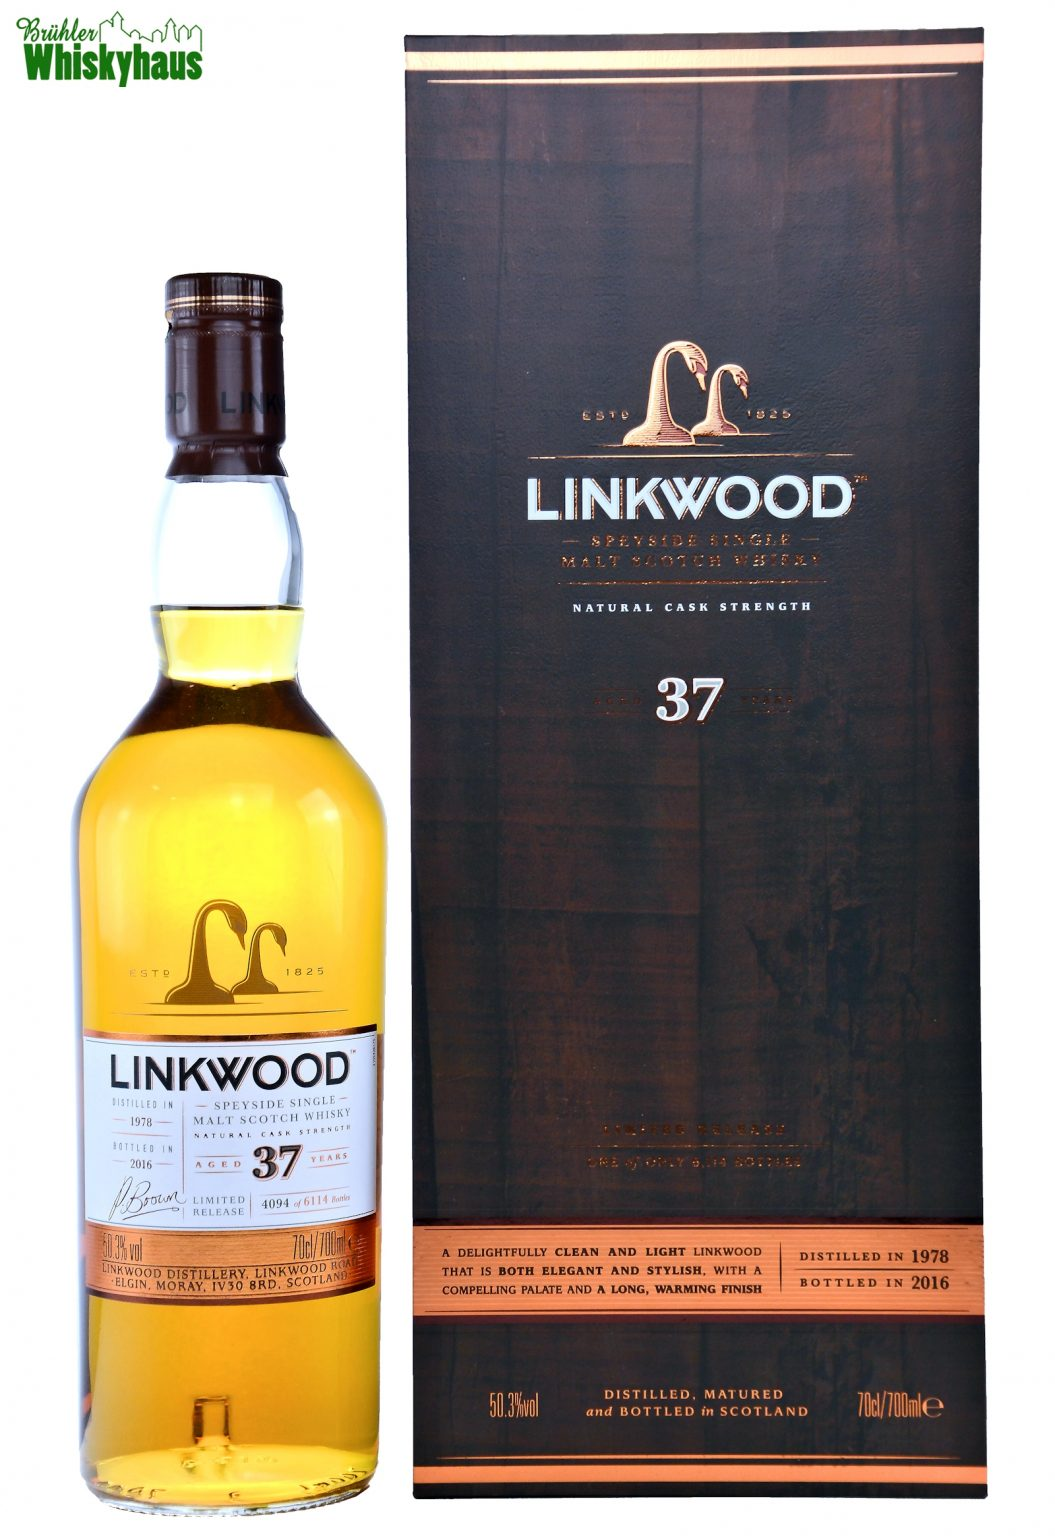 Linkwood Vintage 1978 - 37 Jahre - Limited Release - Single Malt Scotch Whisky